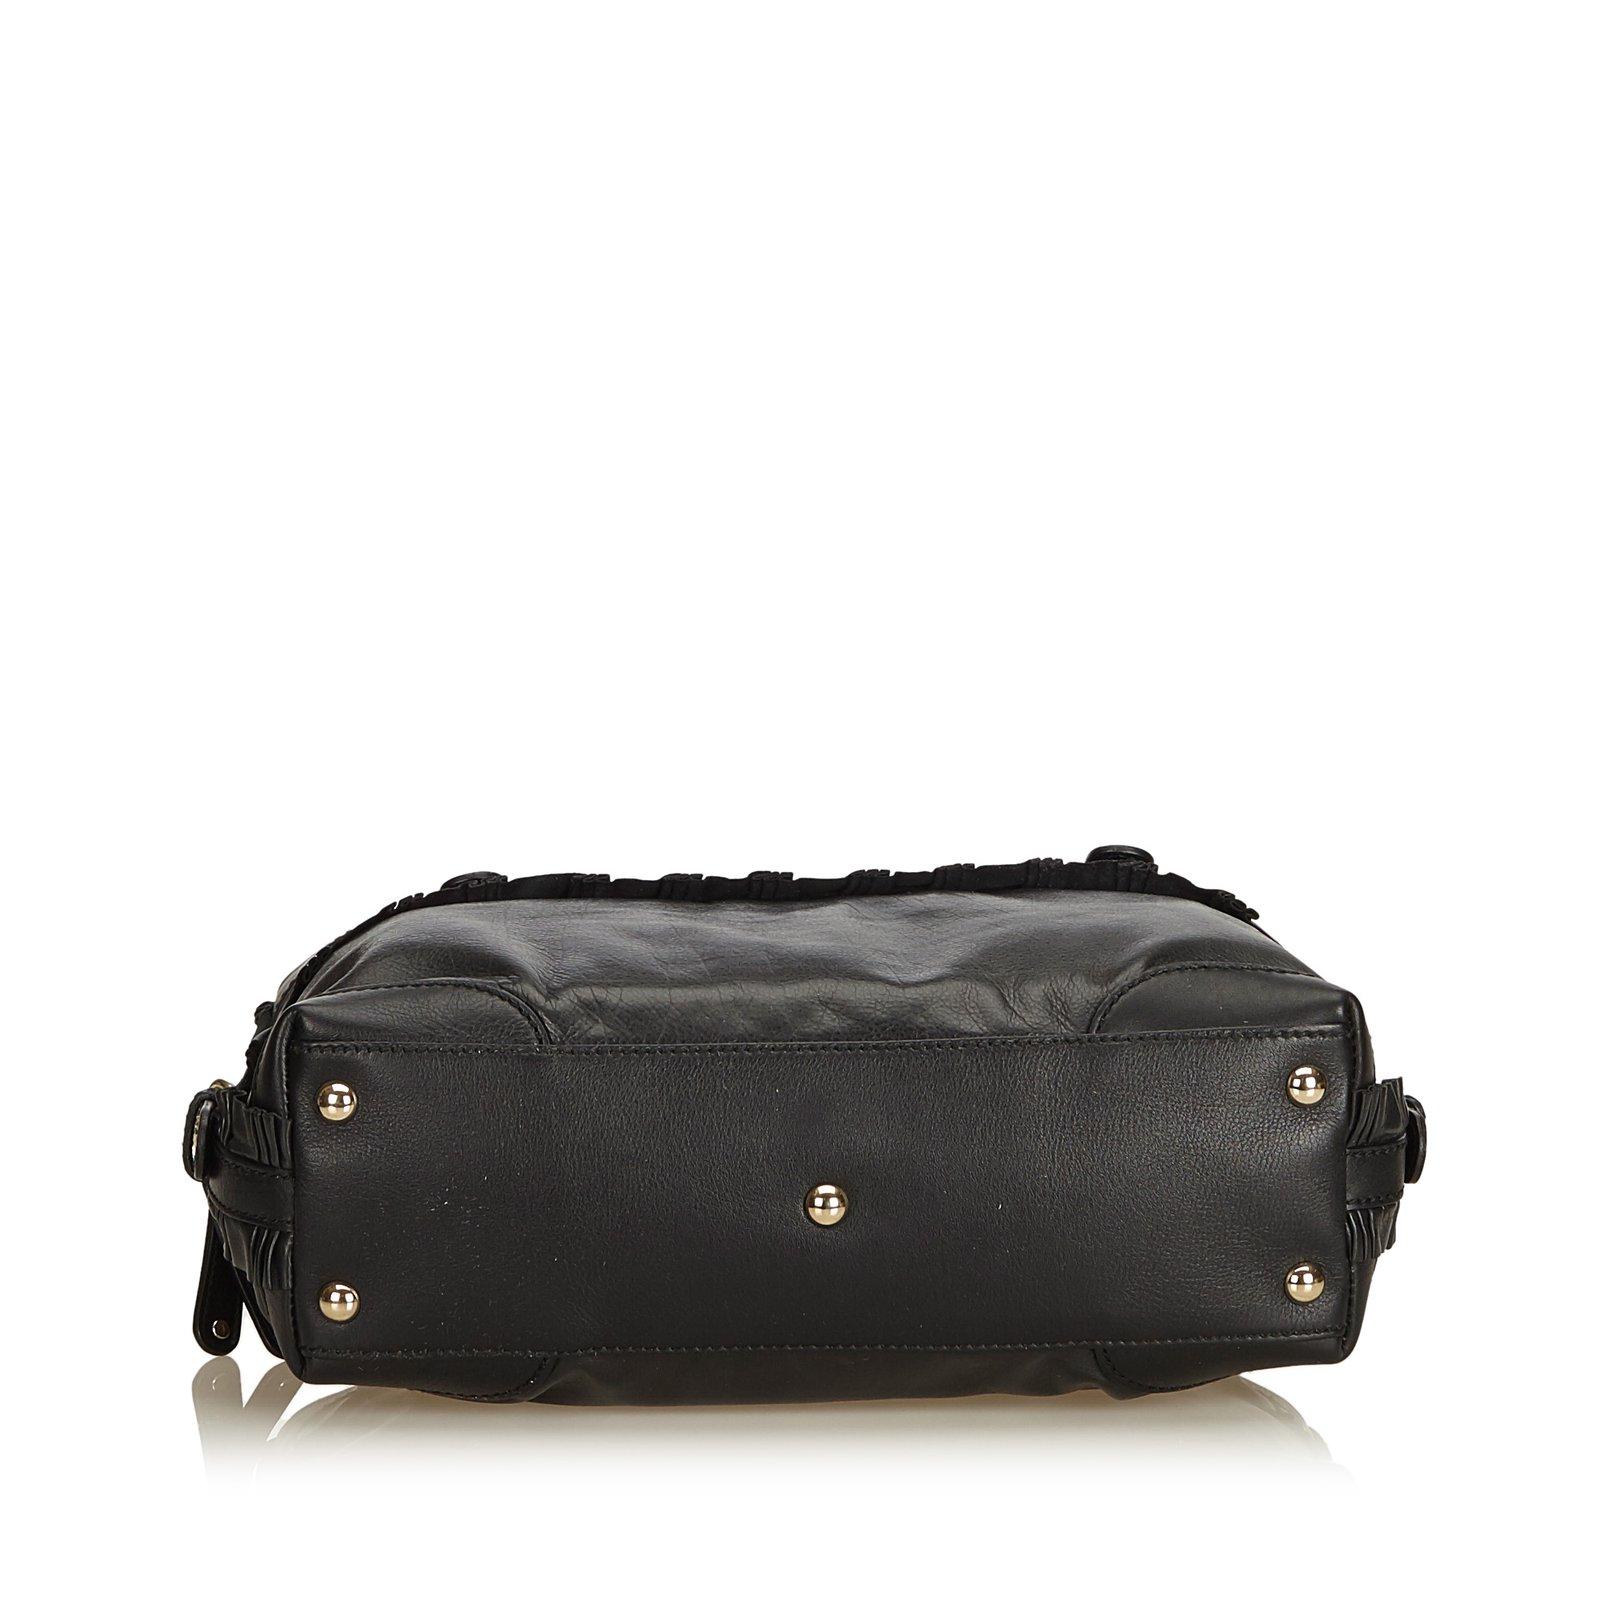 f784c4e2a Gucci Leather Sabrina Shoulder Bag Handbags Leather,Other Black ref.90304 -  Joli Closet